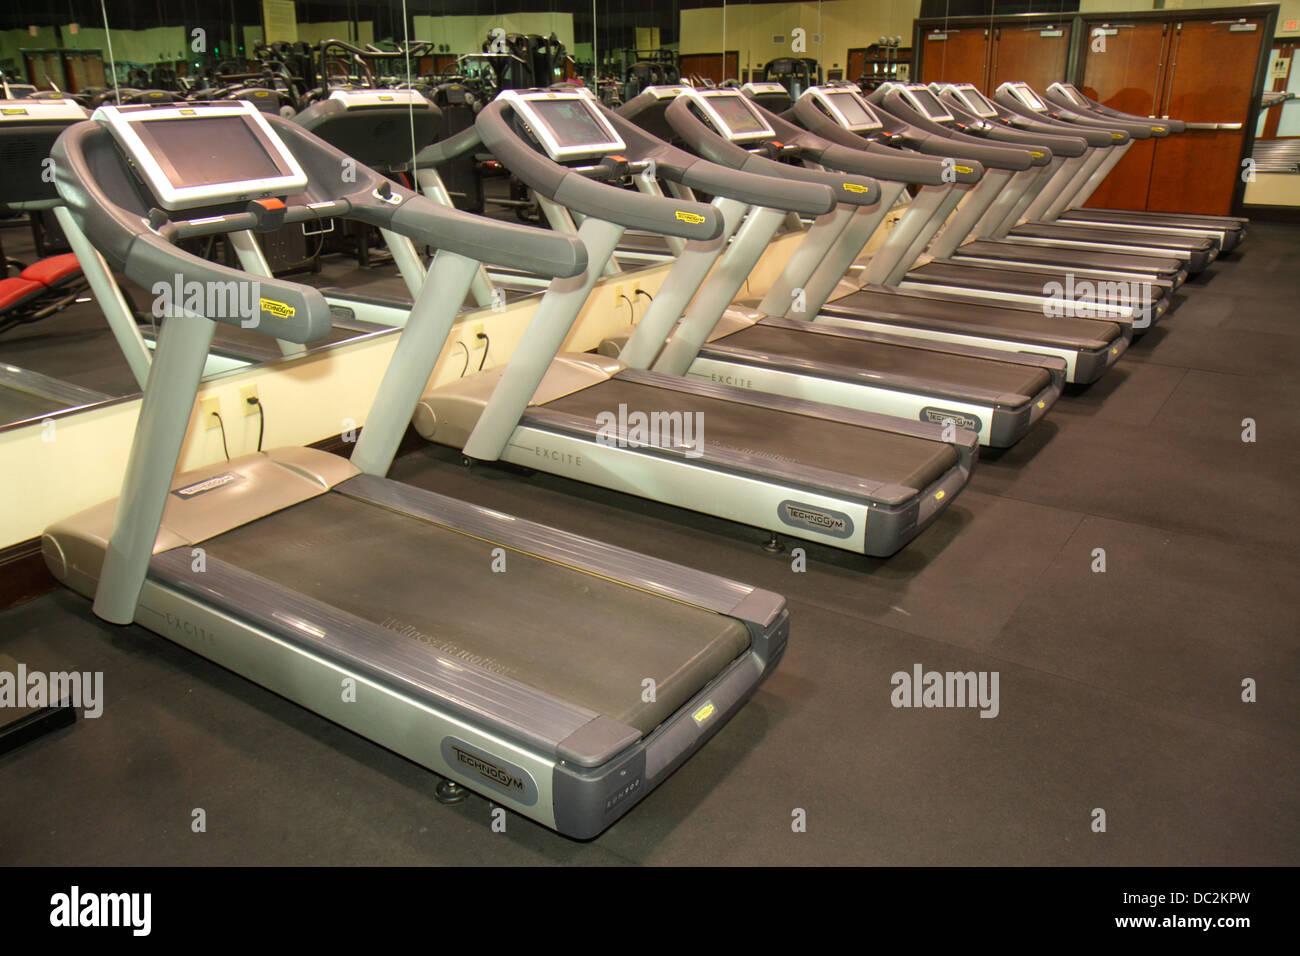 Florida Weston Fort Ft. Lauderdale Bonaventure Resort and & Spa hotel treadmills fitness center centre - Stock Image